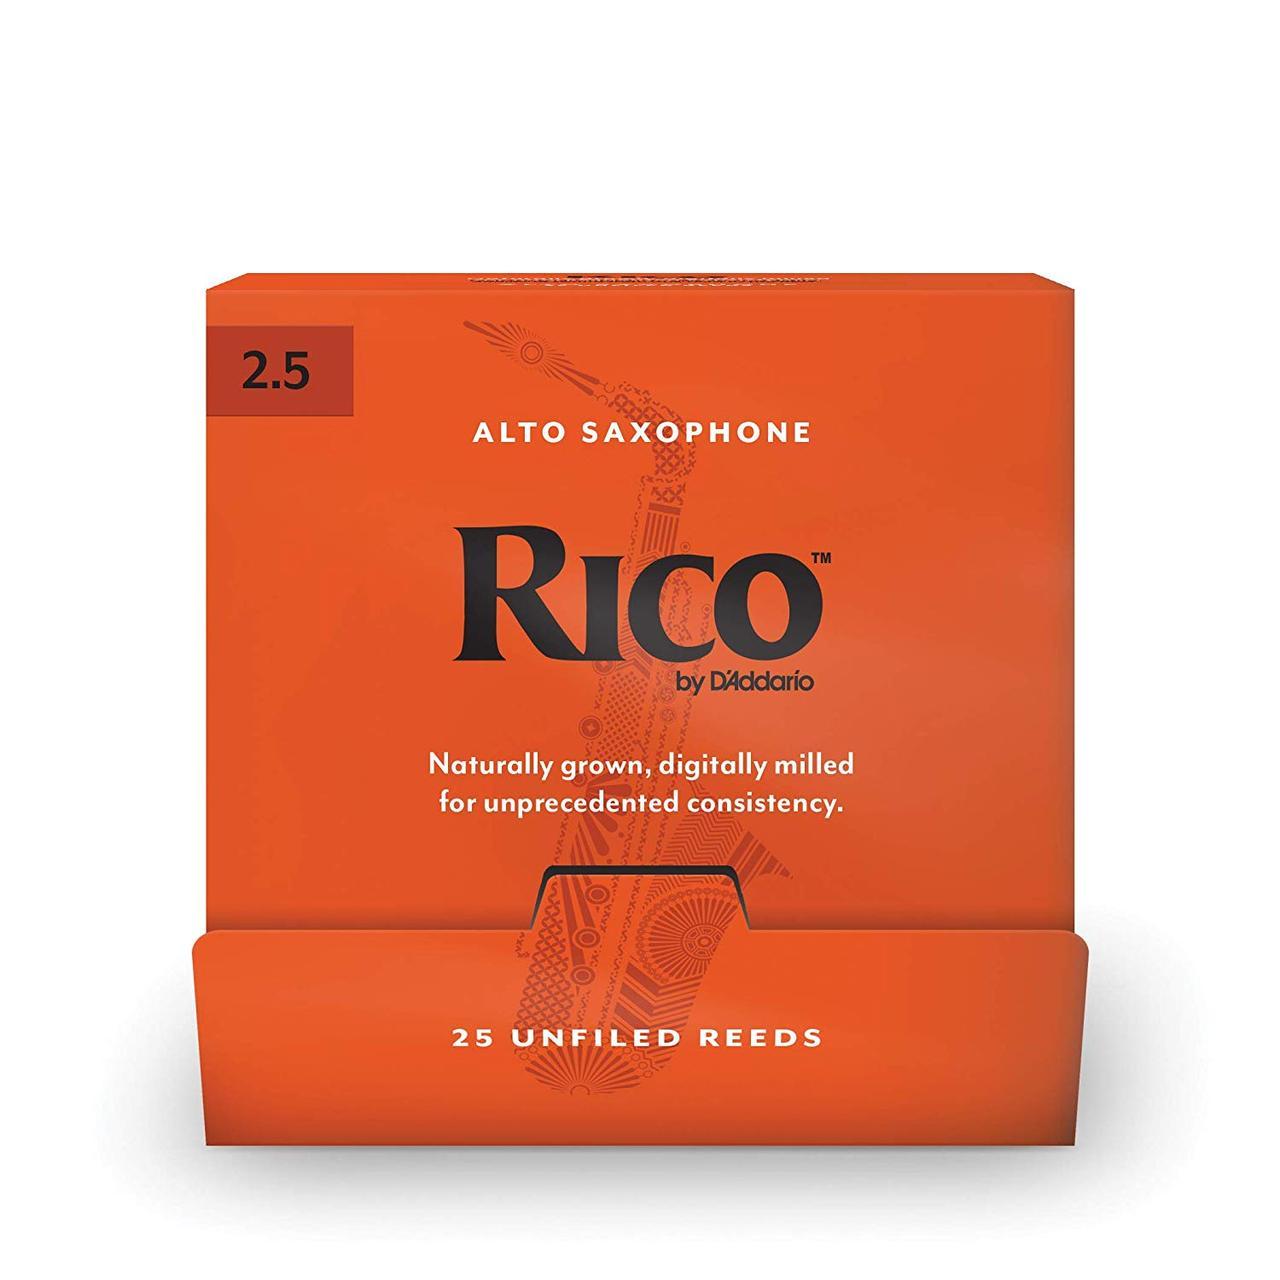 D'Addario Rico - Alto Sax #2.5 - 25 Pack Трости для альт саксофона (RJA0125-B25)